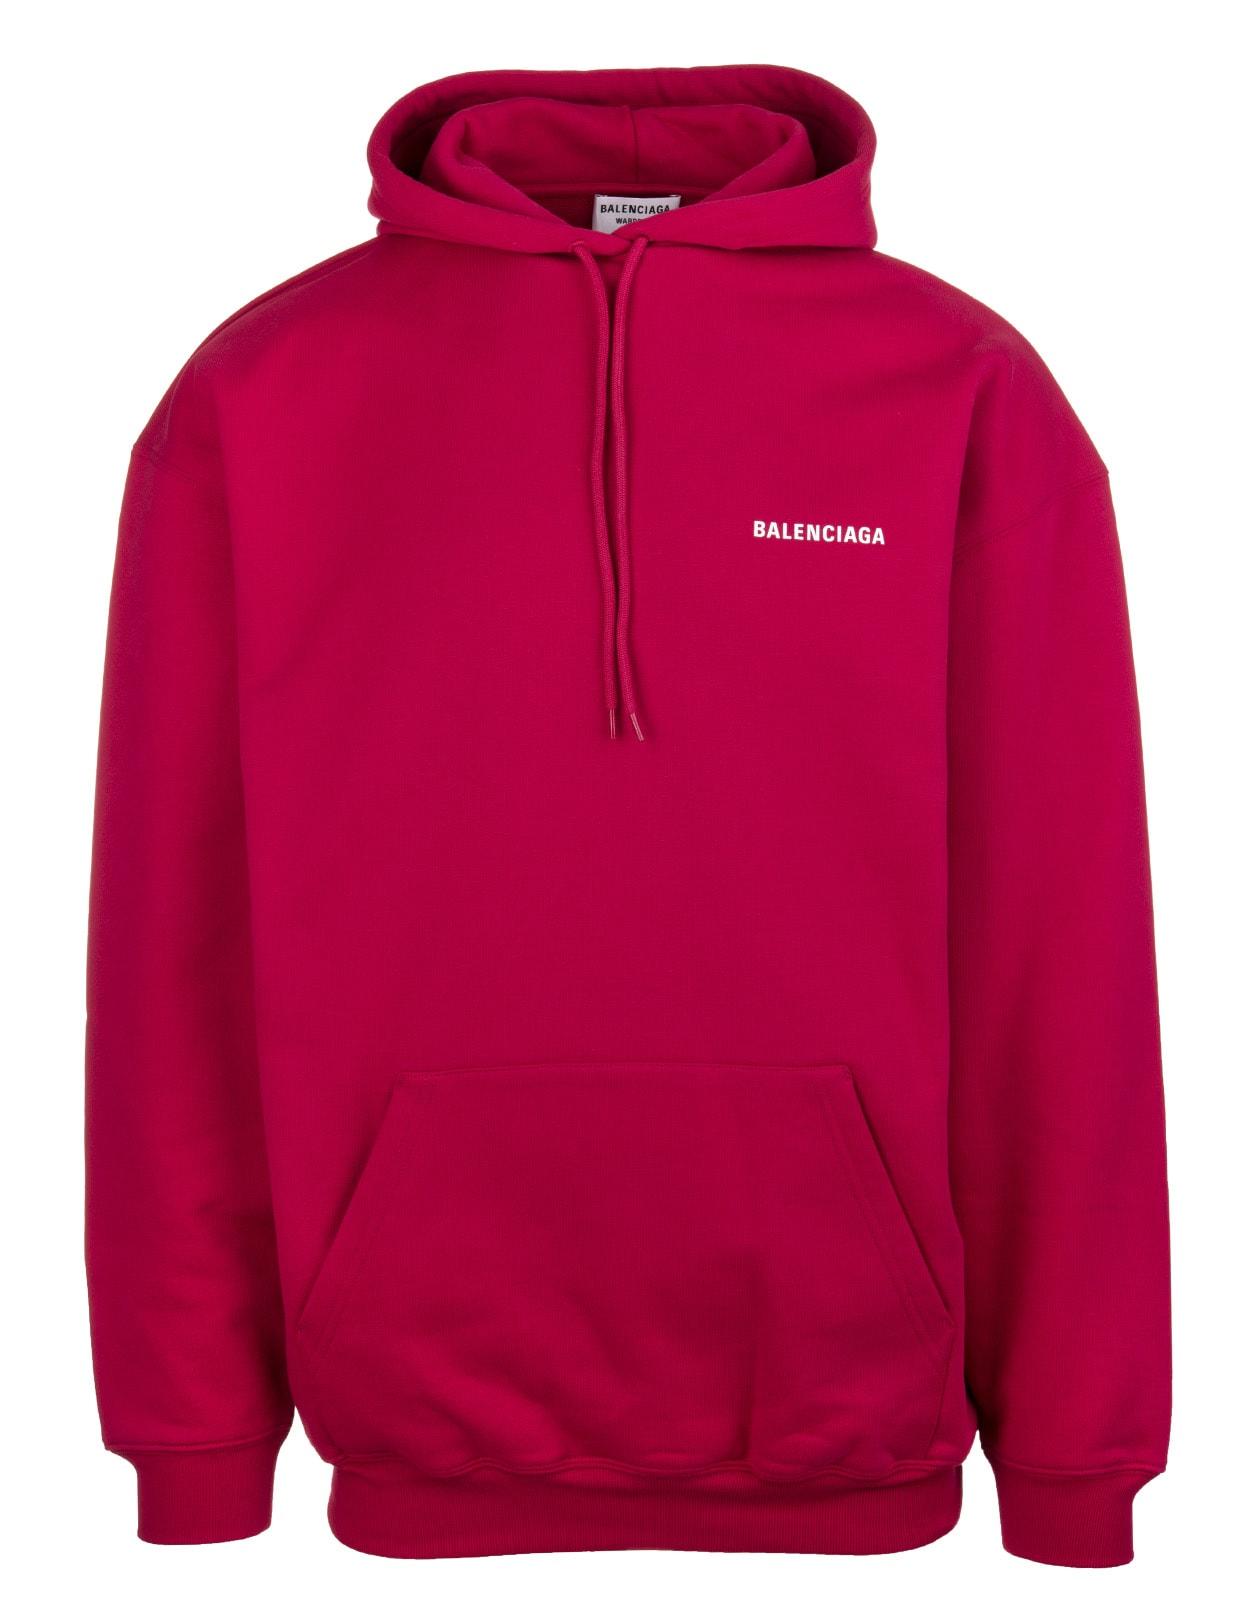 Unisex Red Balenciaga Wide Line Hoodie